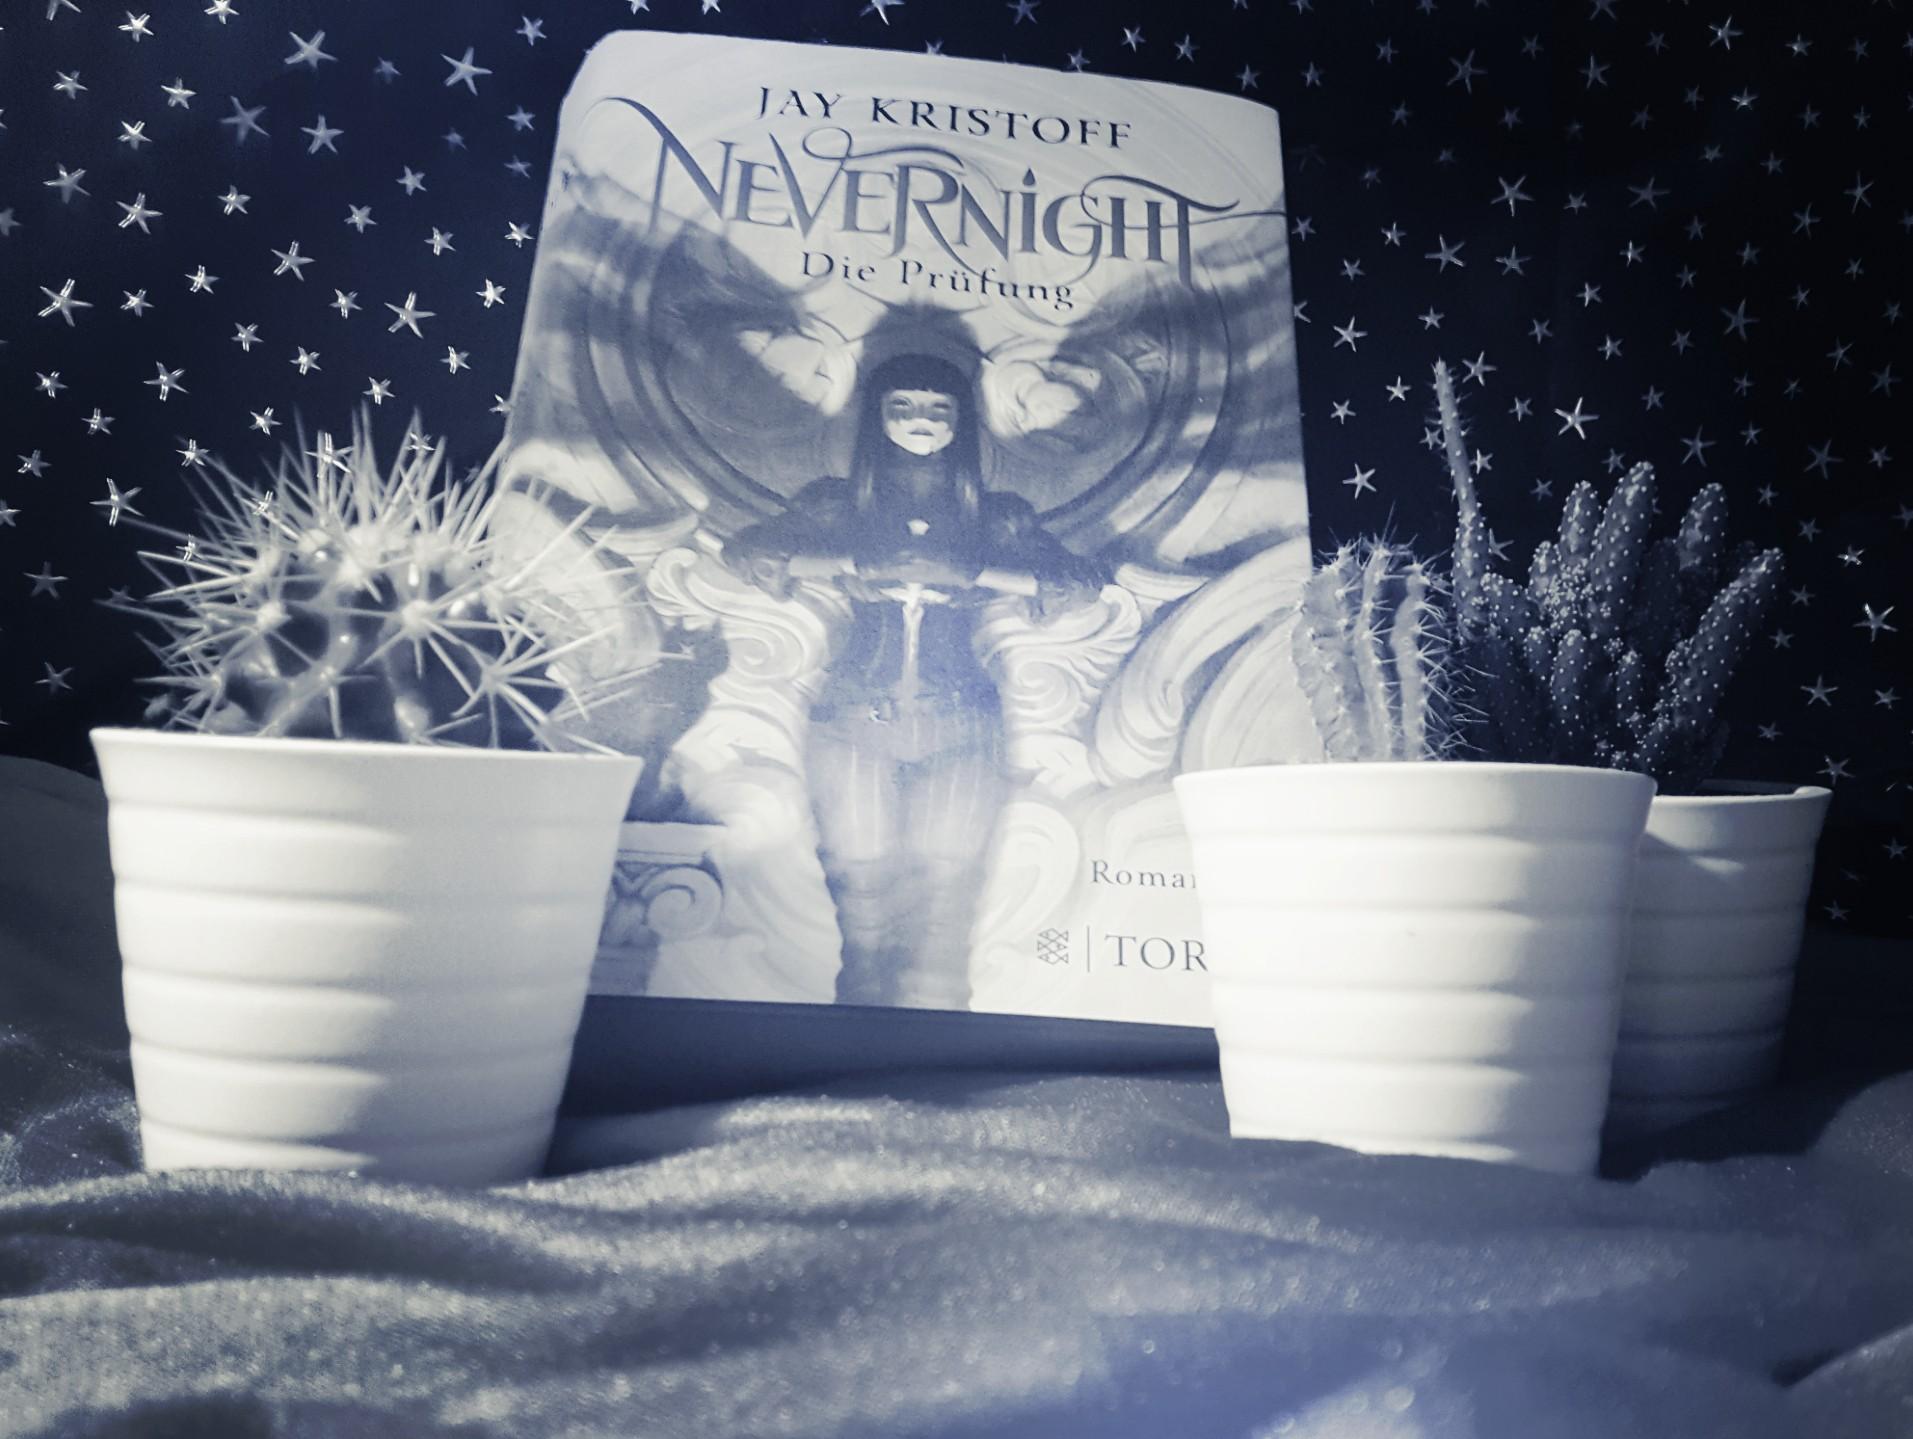 [Rezension] Jay Kristoff – Nevernight. Die Prüfung